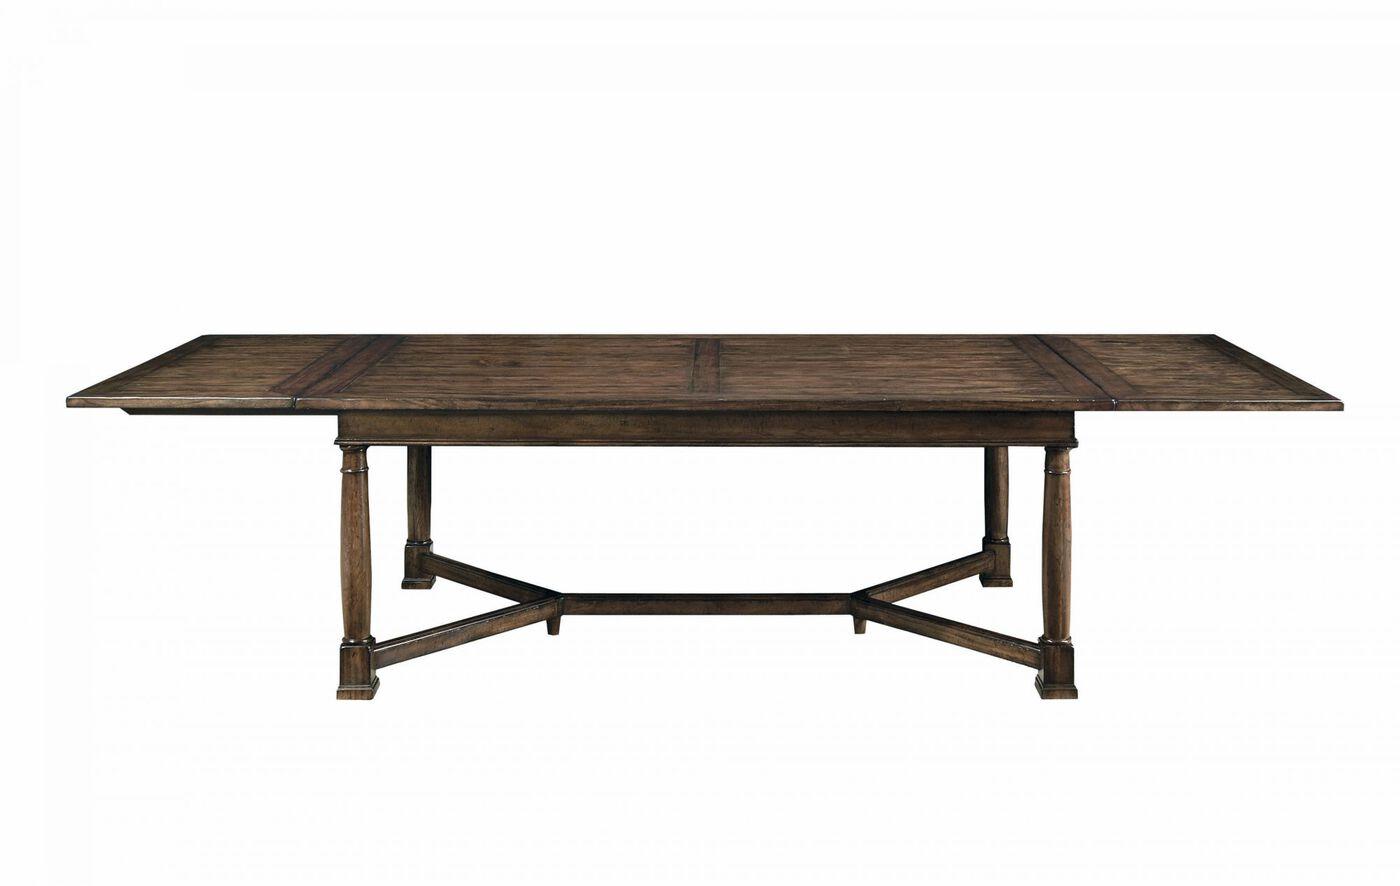 Bernhardt Vintage Patina Trestle Dining Table Mathis Brothers Furniture